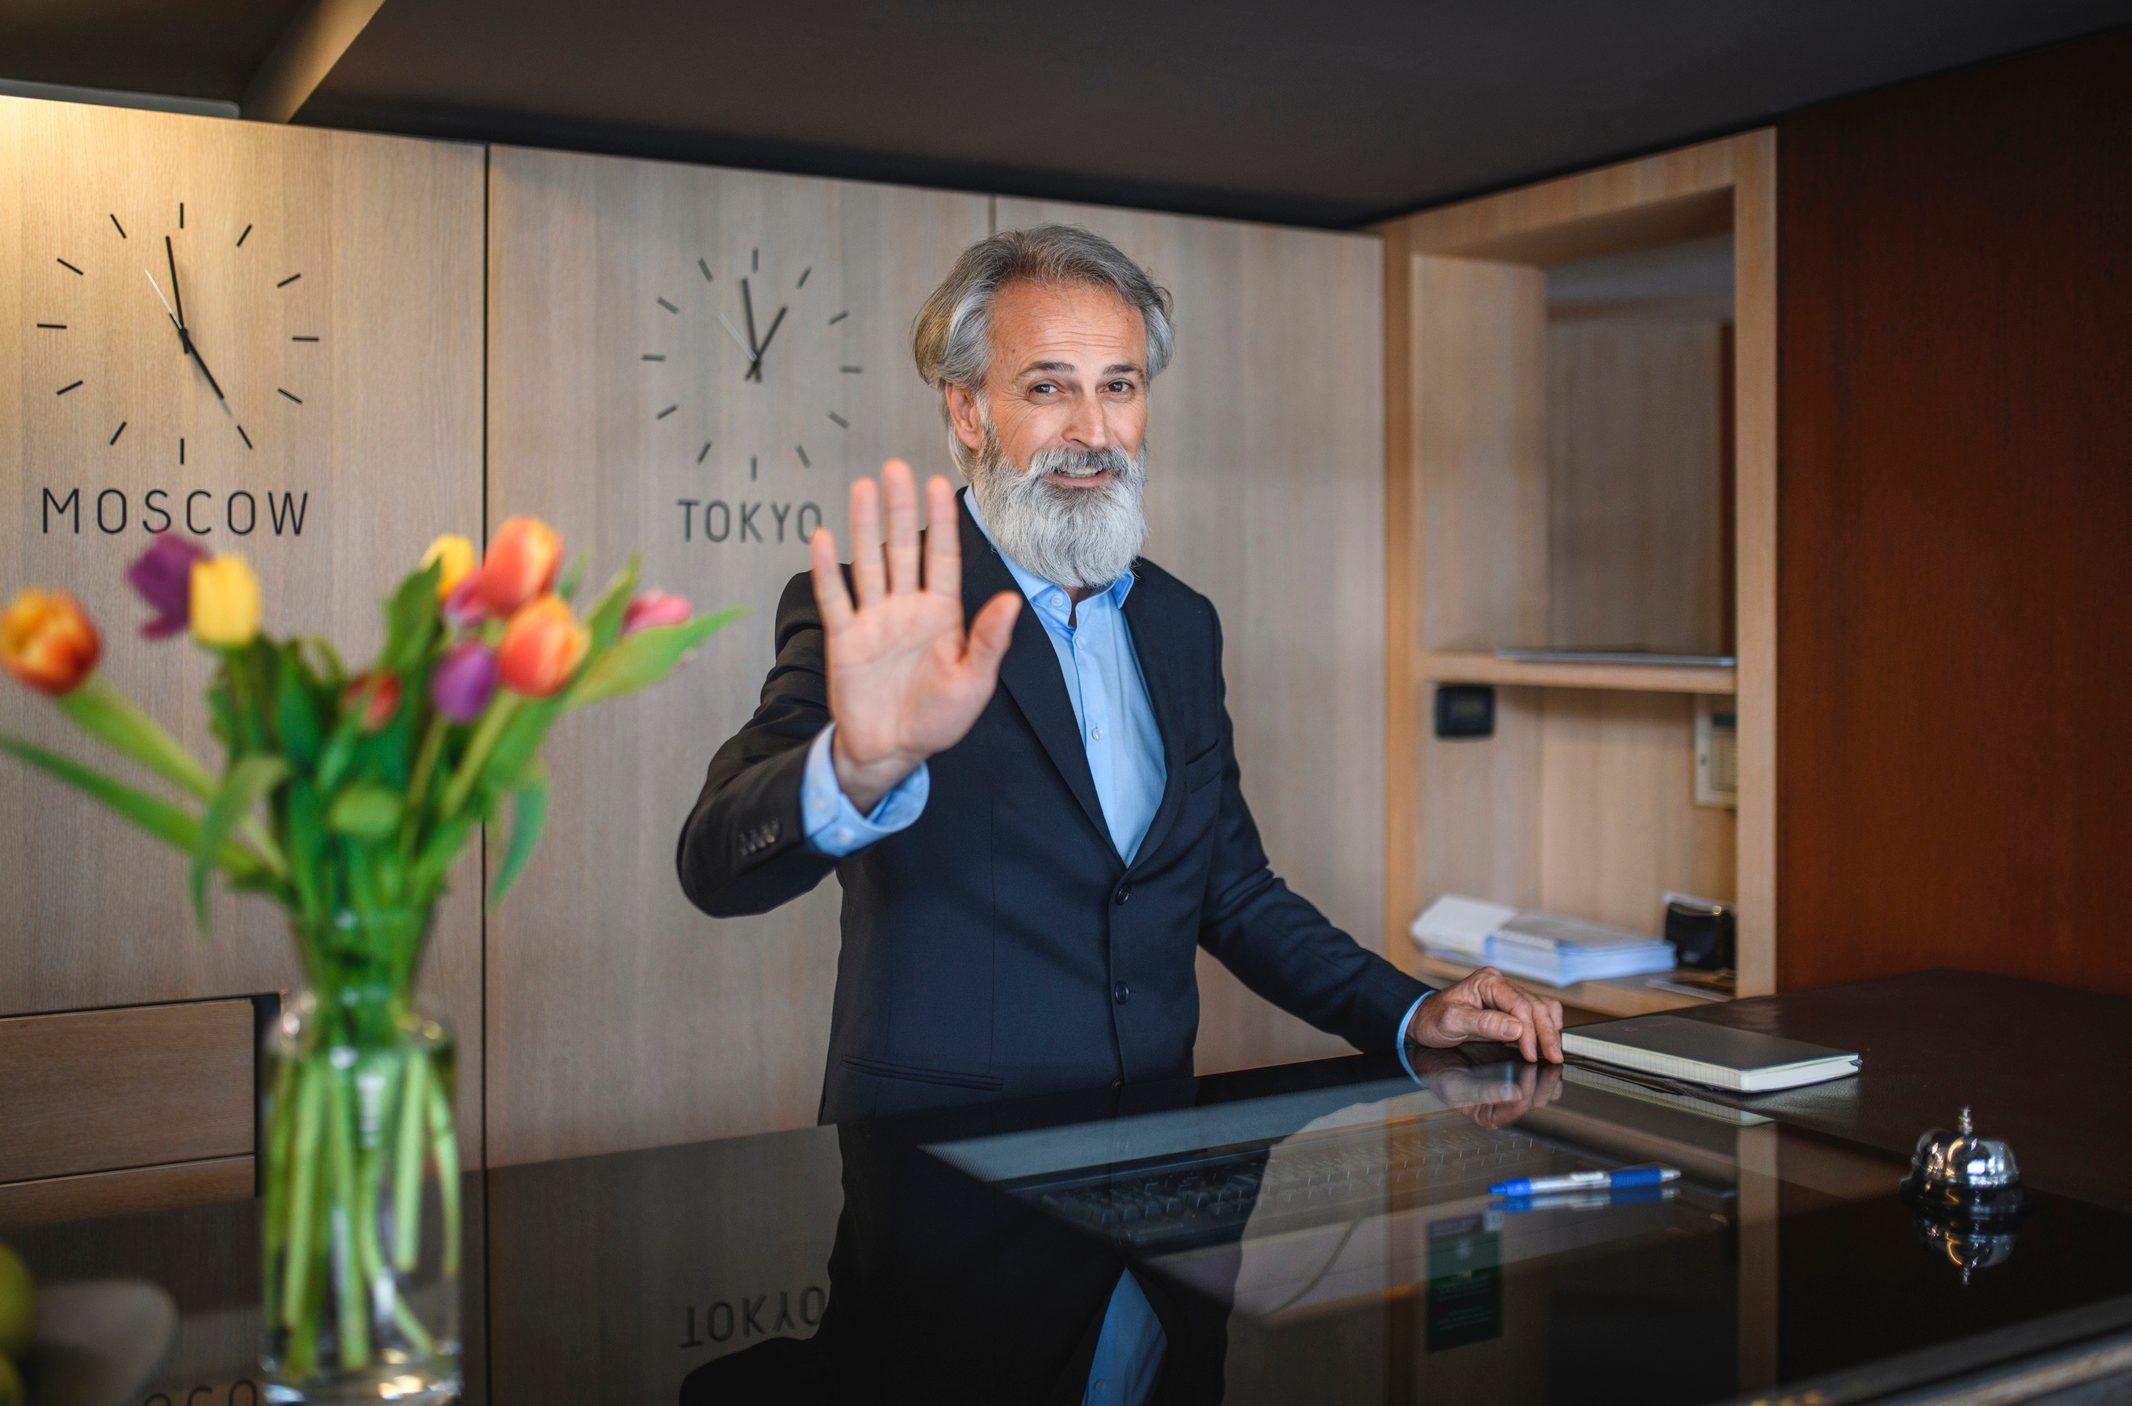 Mature Male Hotel Receptionist Bidding Guest Farewell